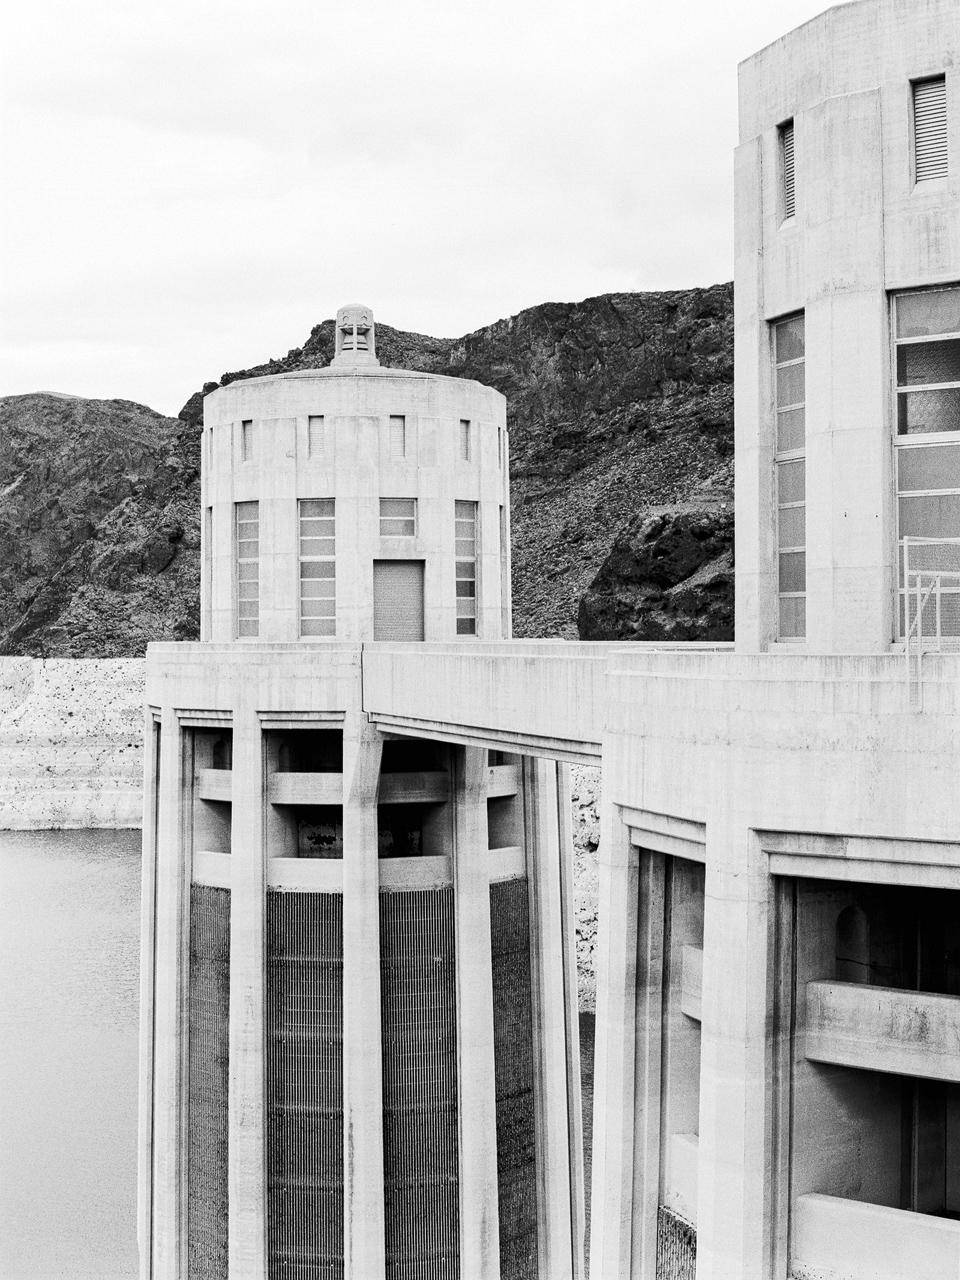 Hoover Dam, 2015